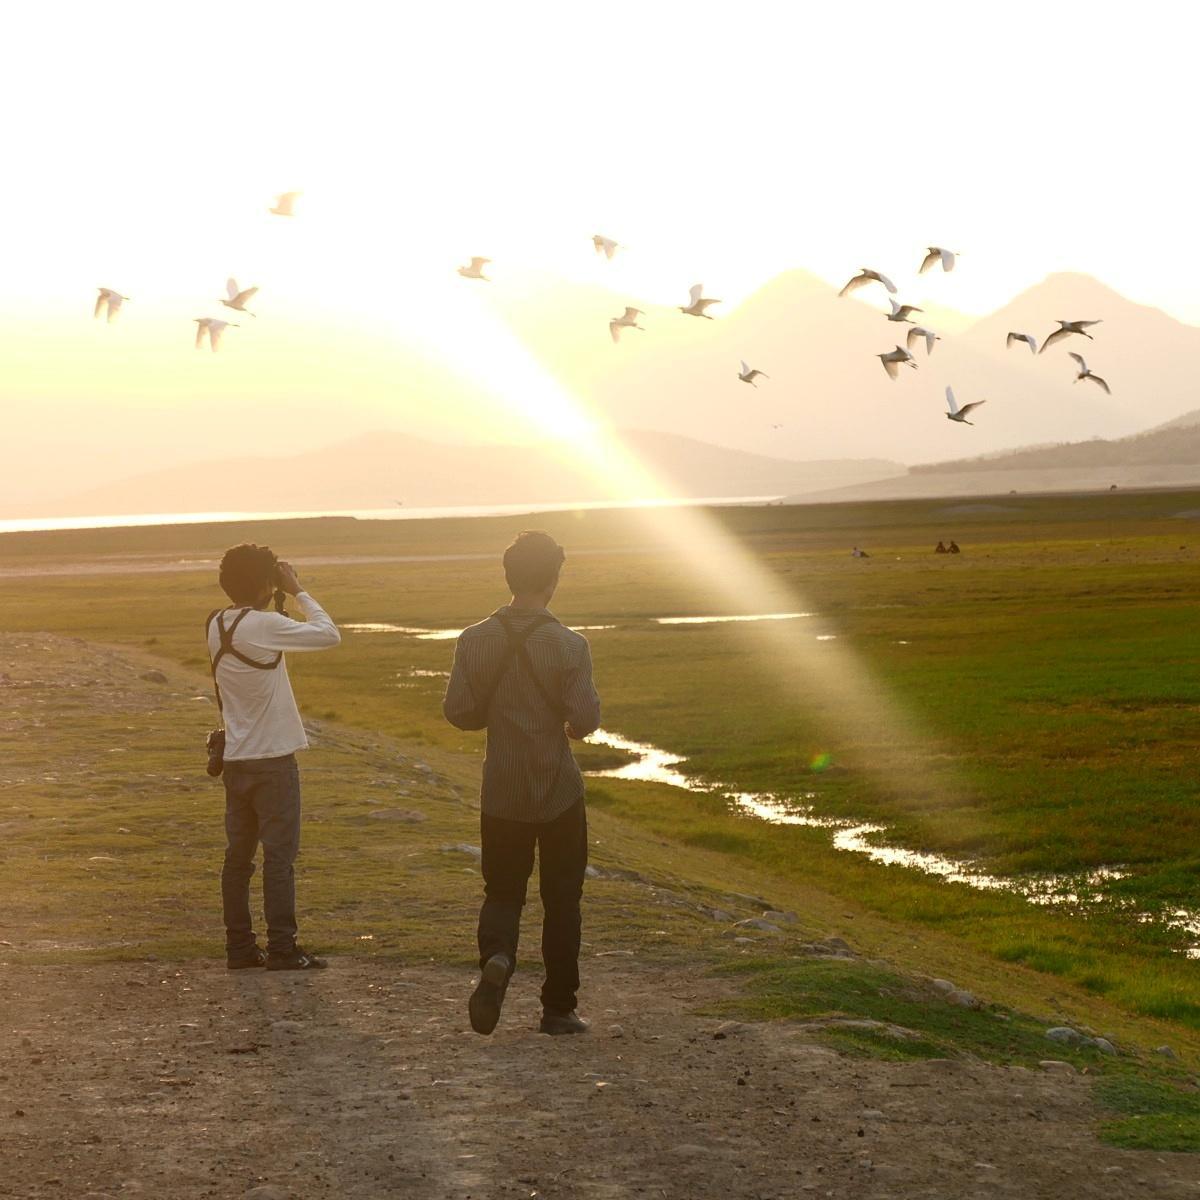 Carlos and Juan watch egrets fly at sunset near Chaparri park in northwest Peru. Noah Strycker